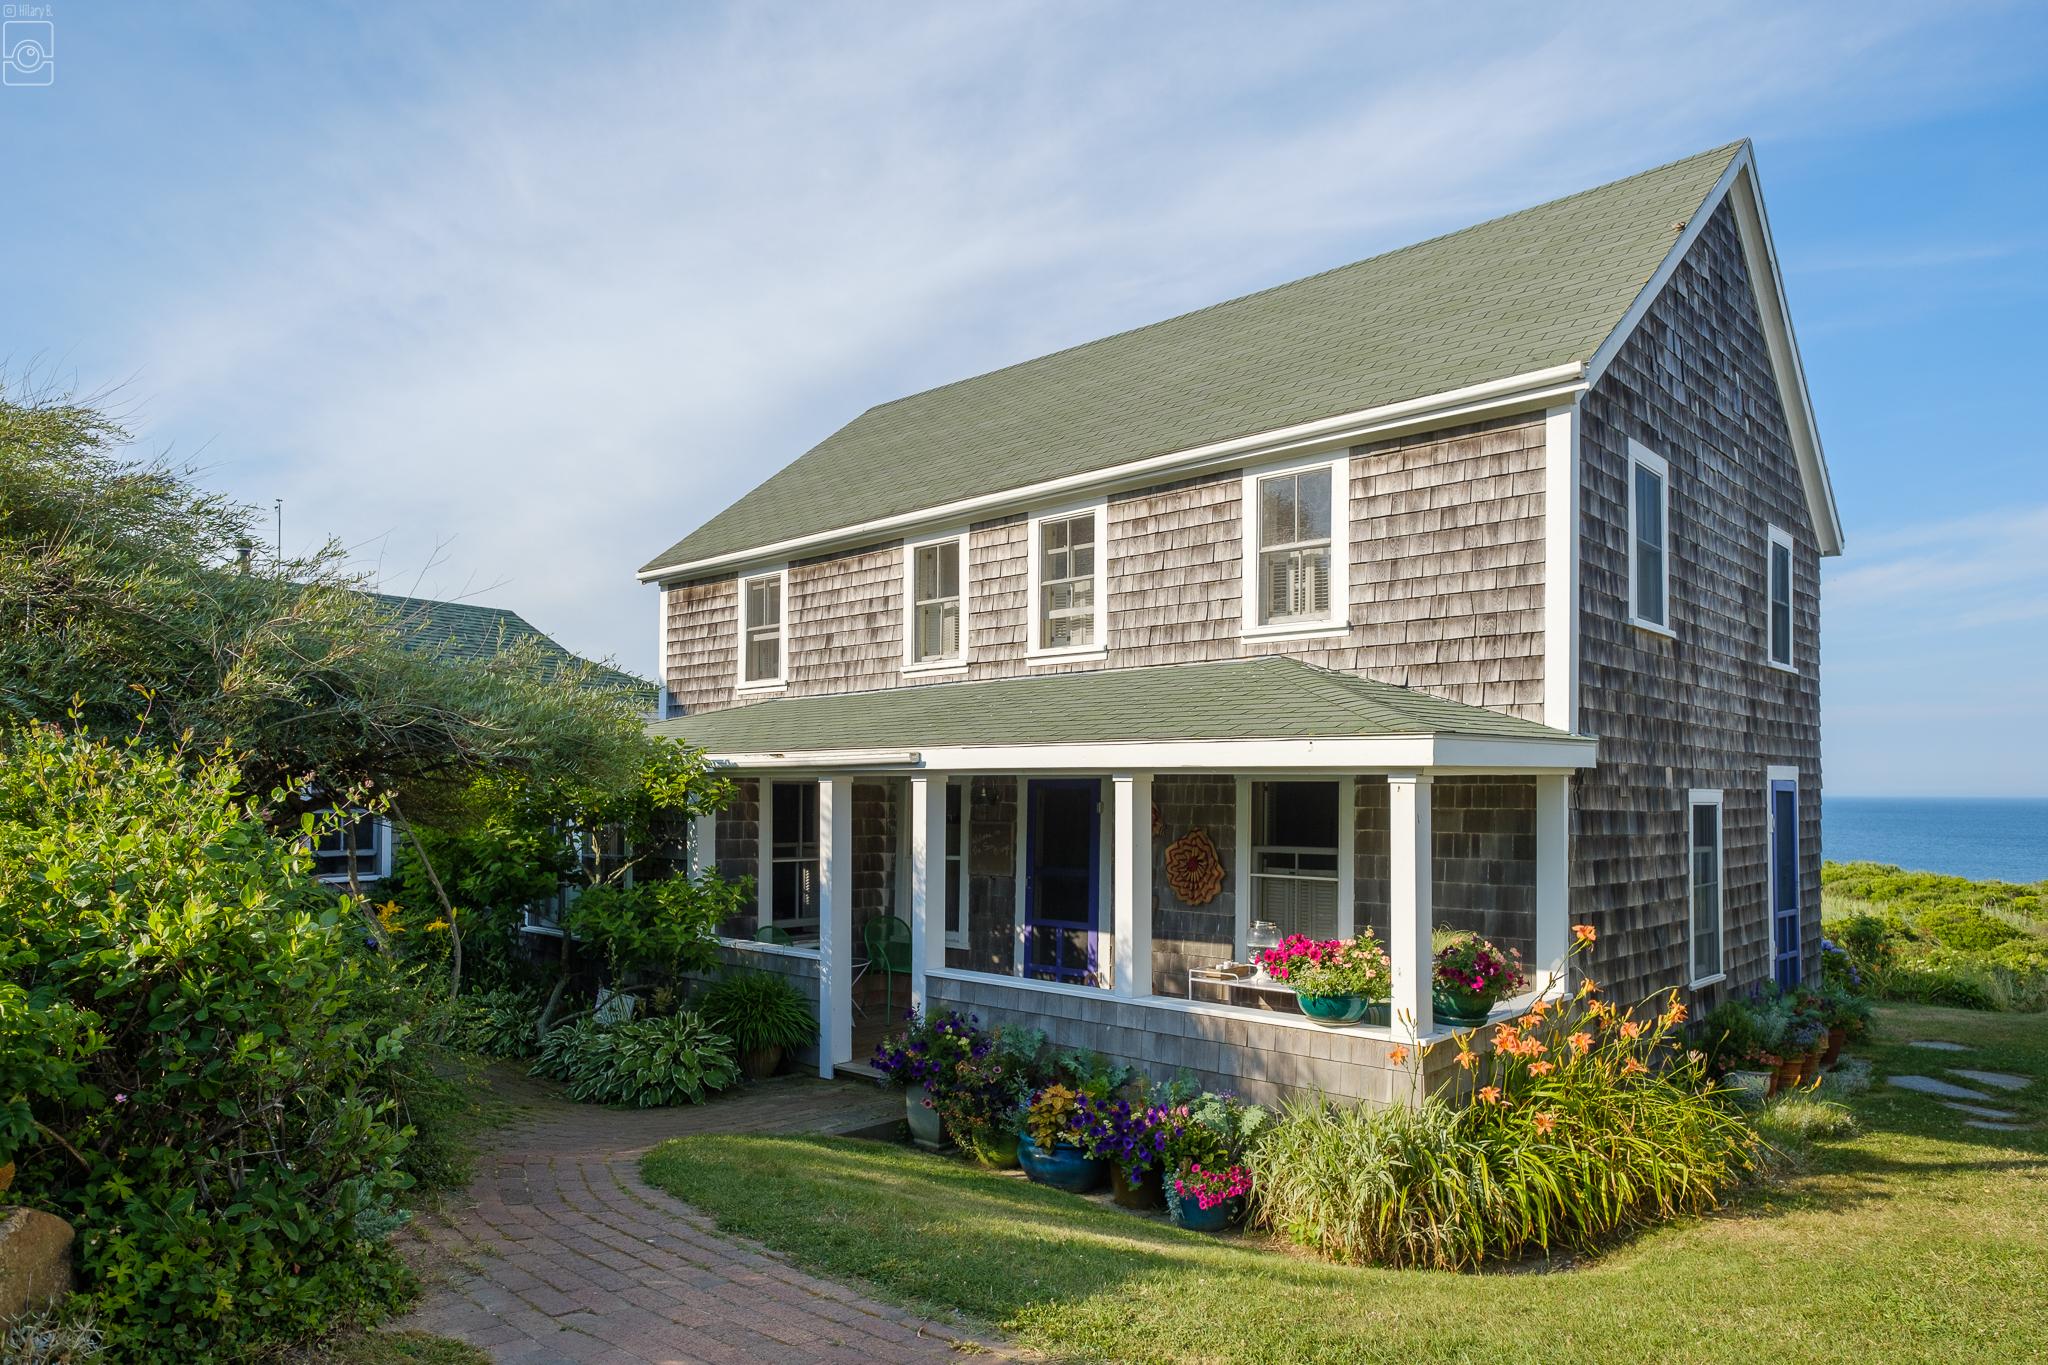 Inlet Cottage